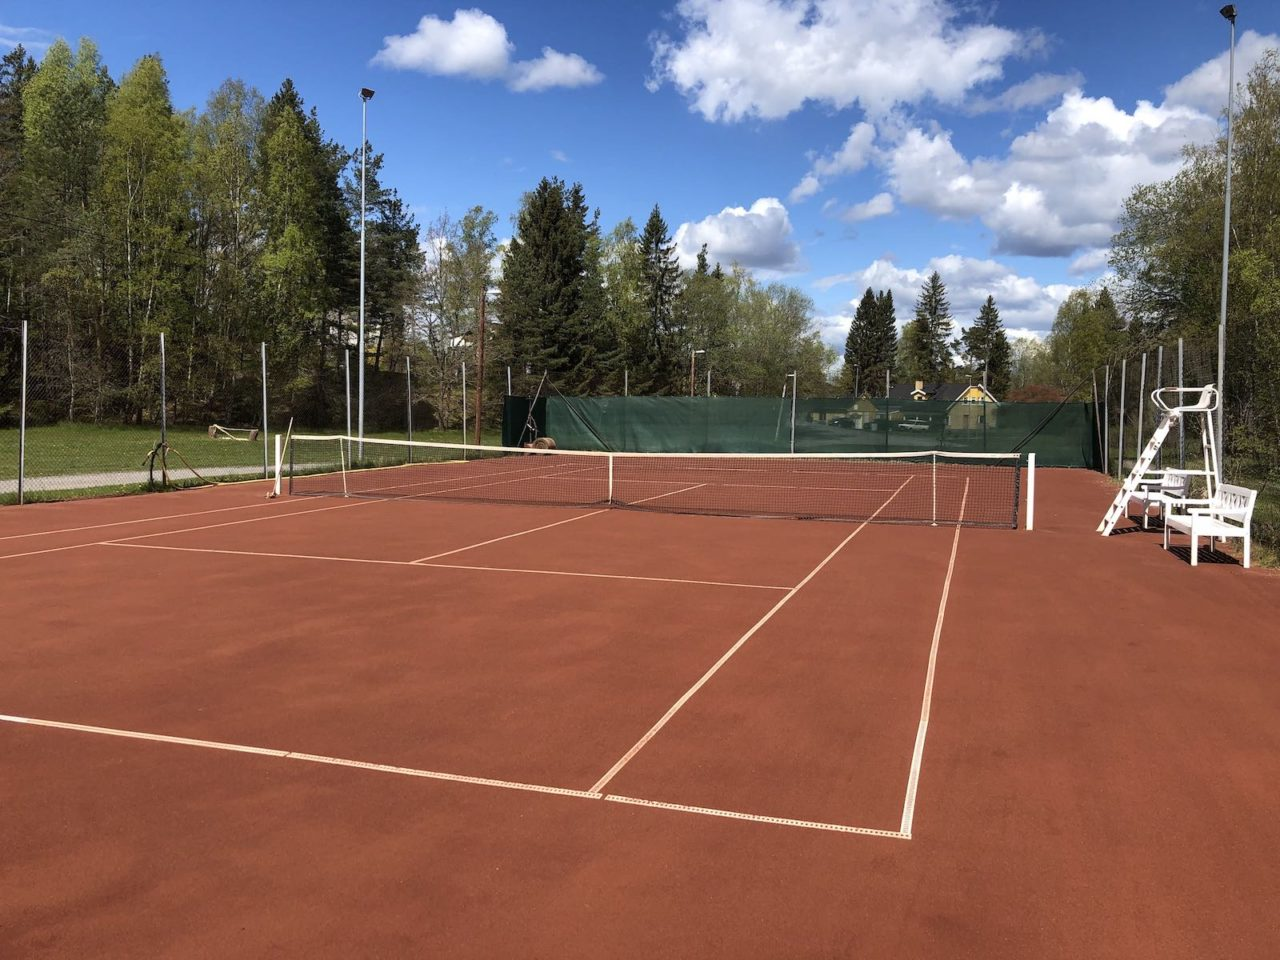 fardala-tennisbanor-ttk-1280x960.jpg